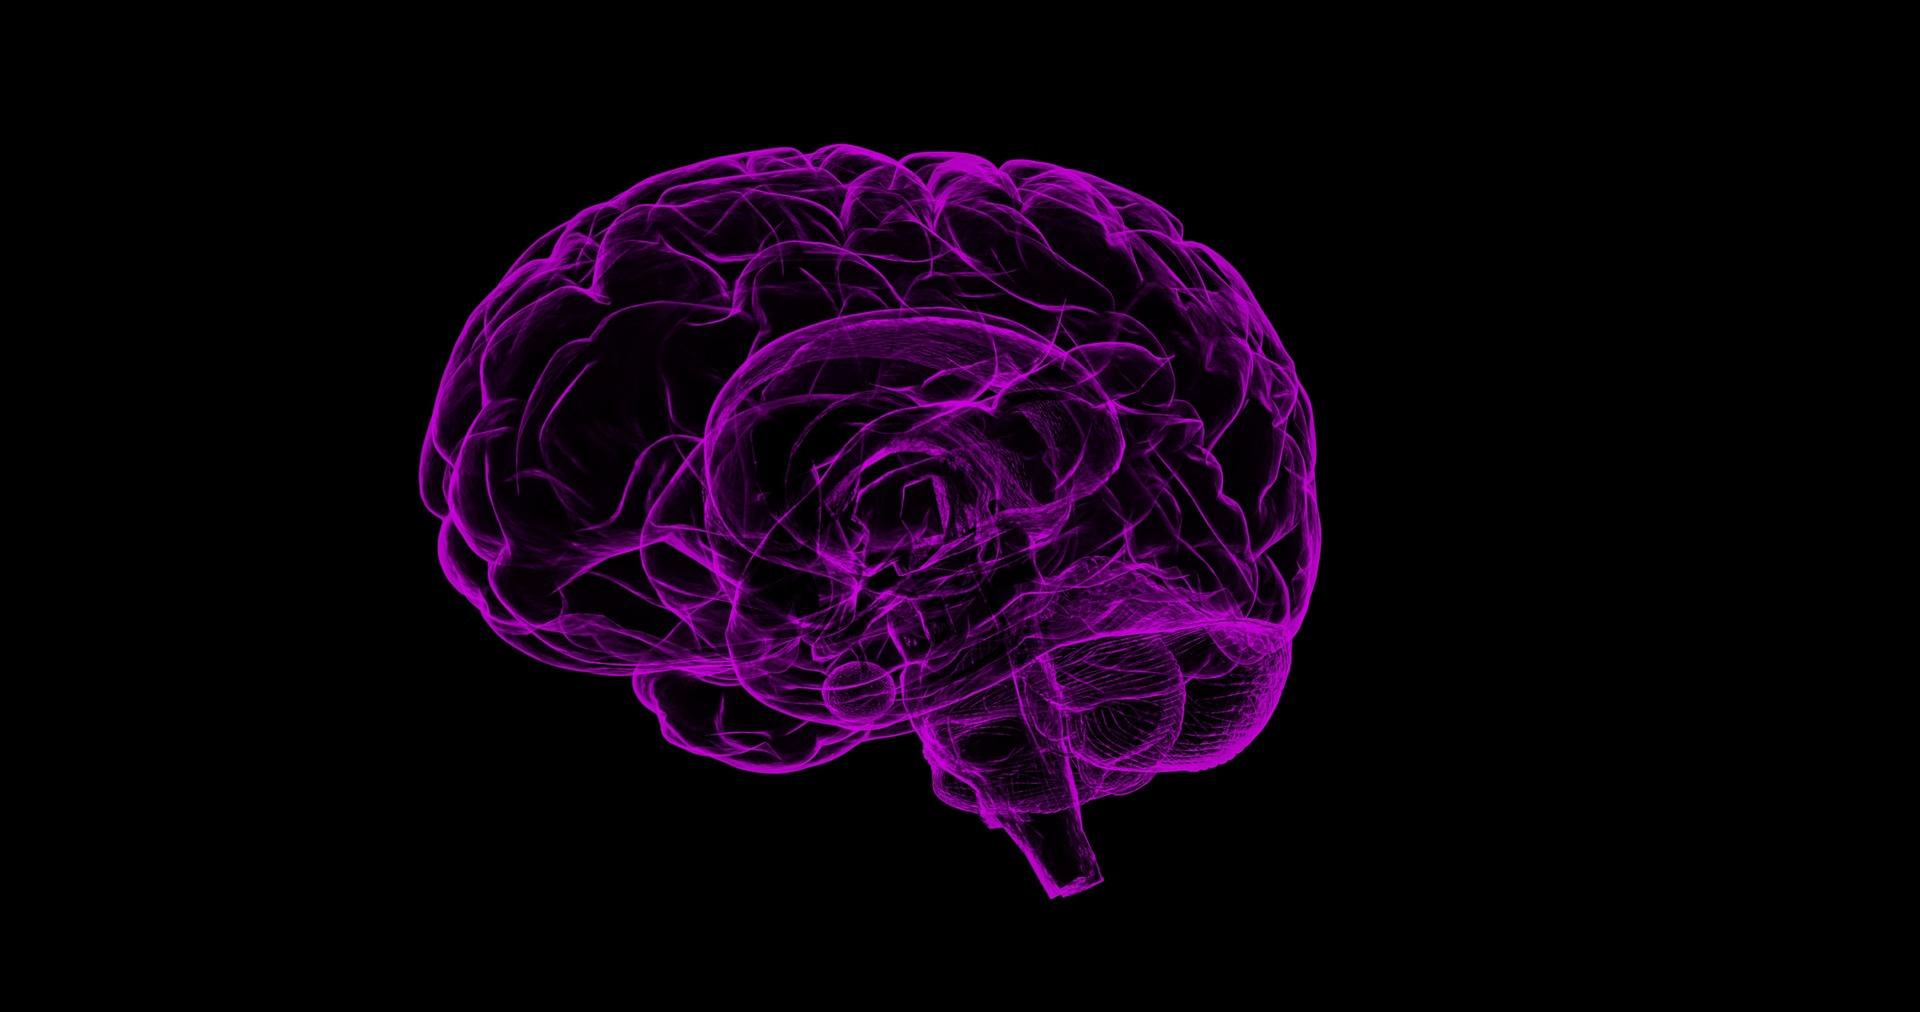 Nominations Open for Joseph Altman Award in Developmental Neuroscience